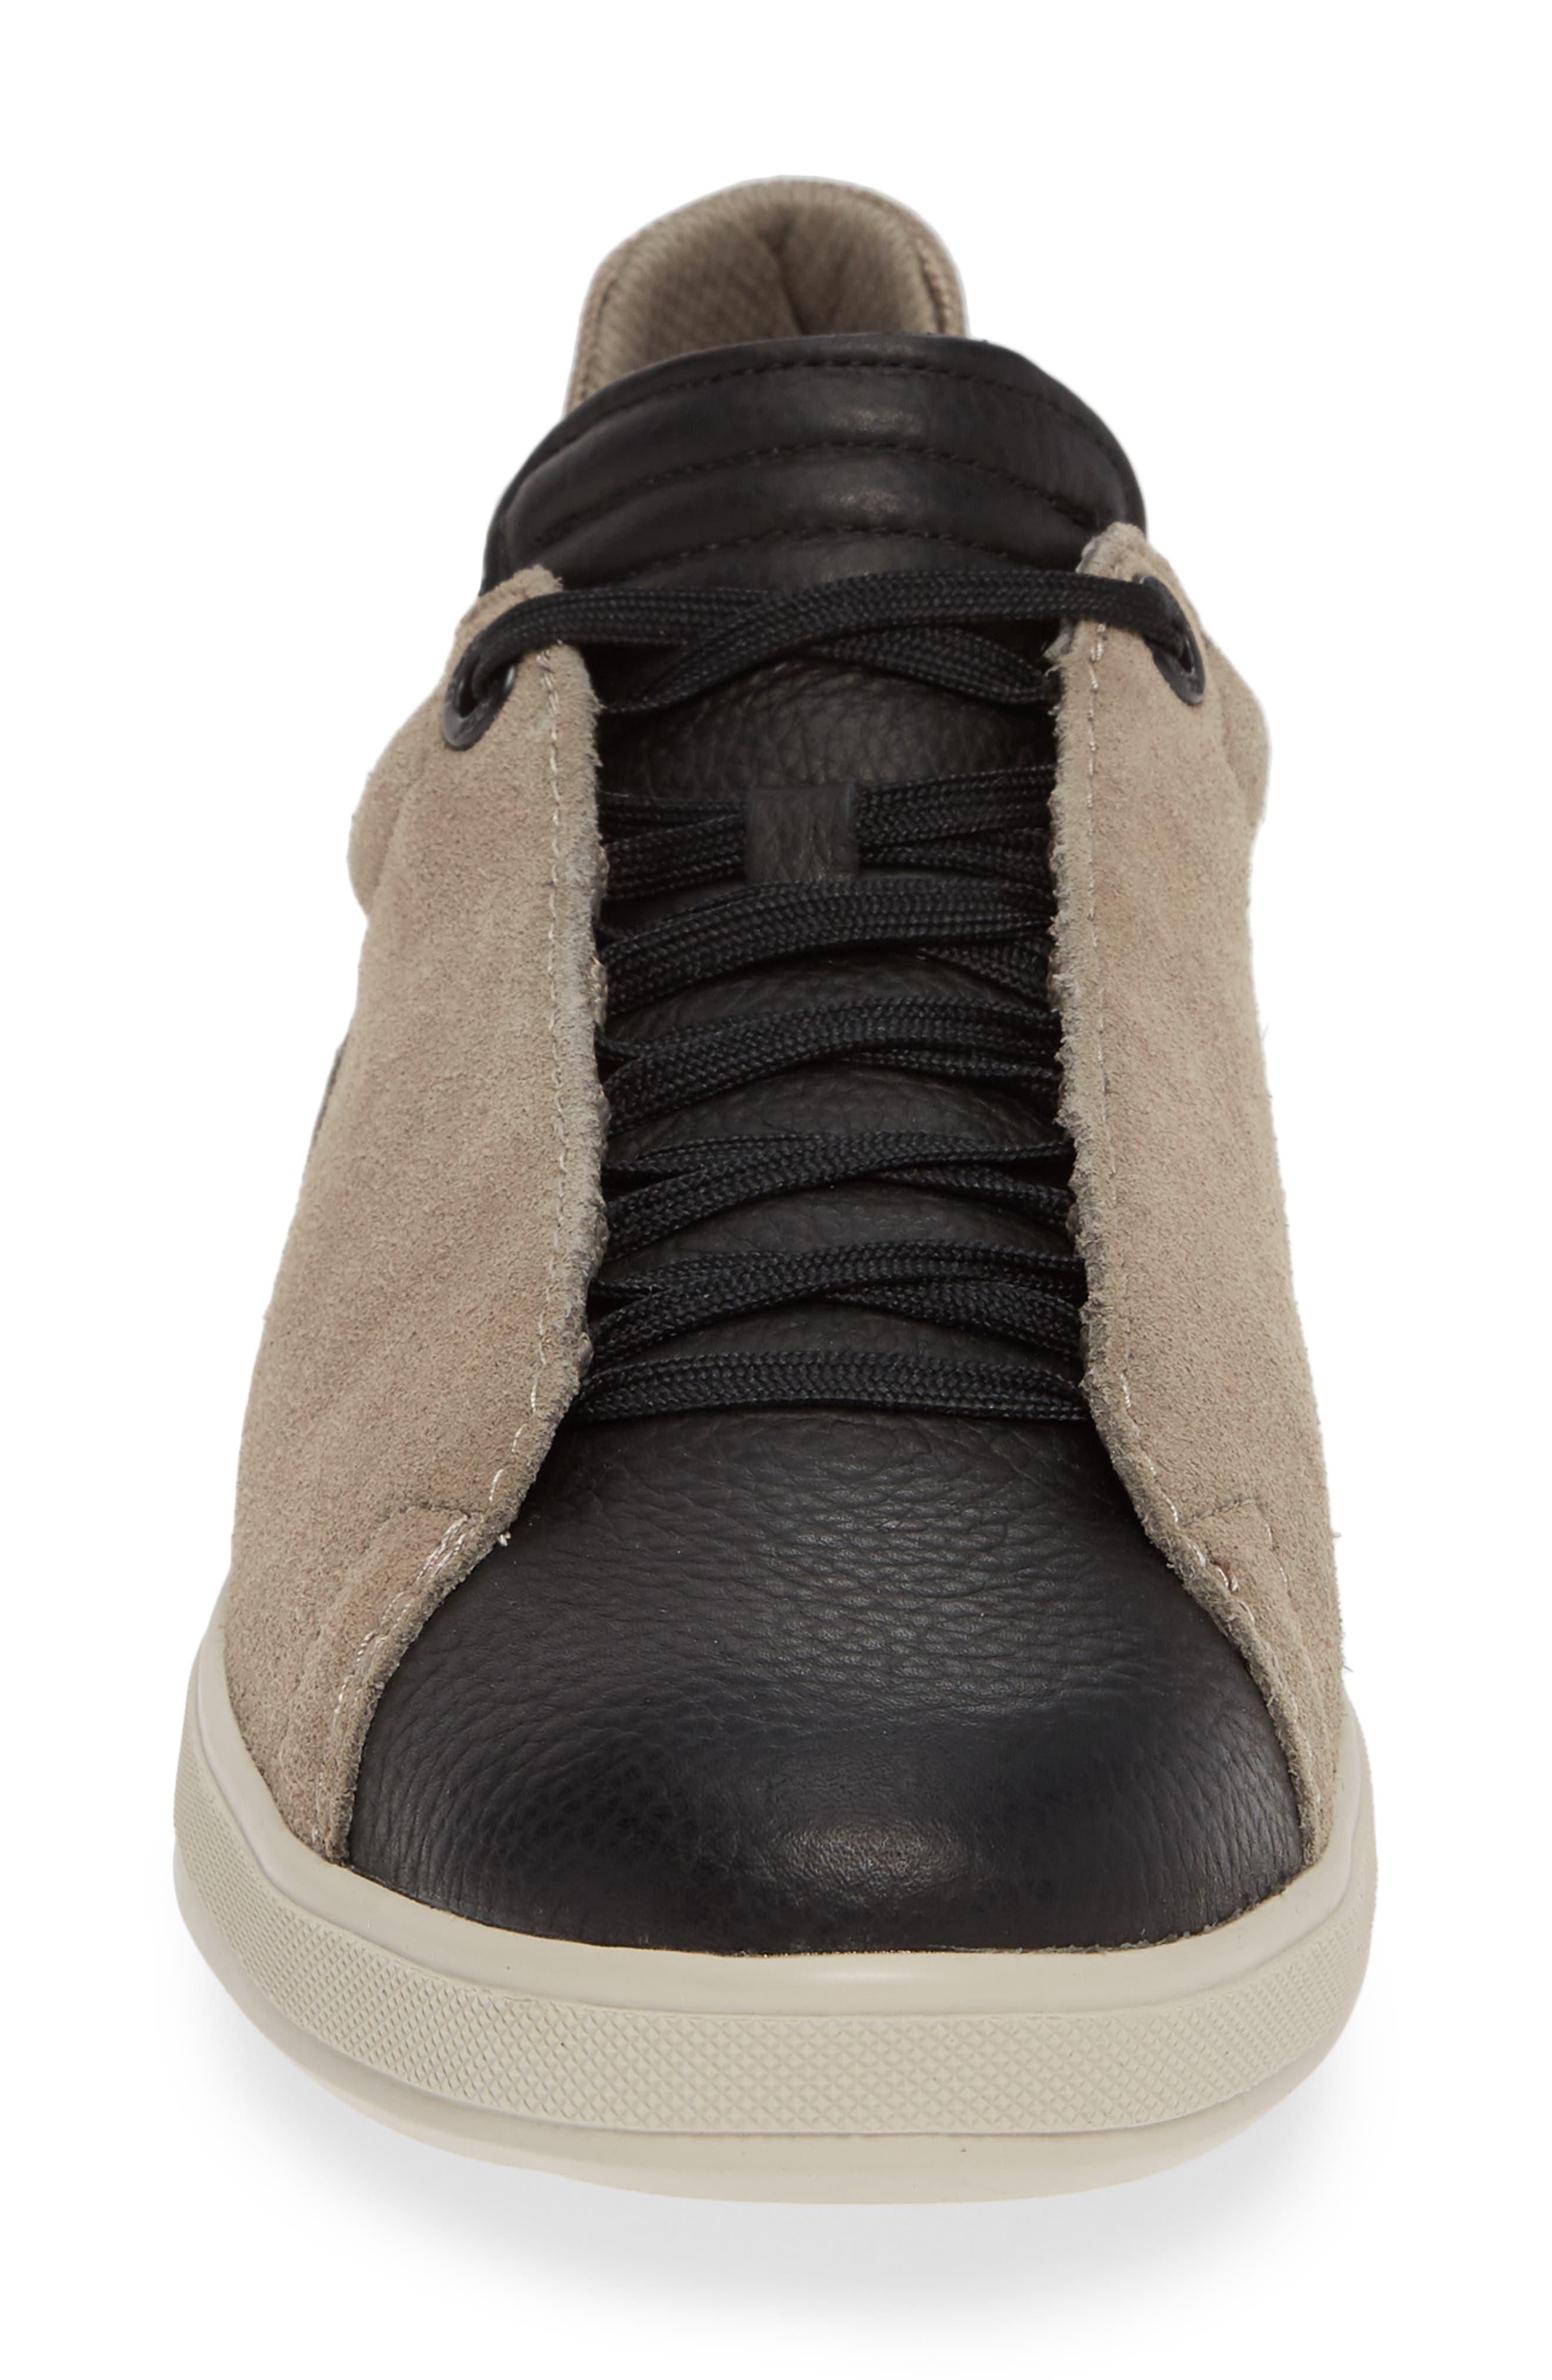 Joe Papa Low Top Sneaker,                             Alternate thumbnail 4, color,                             STONE/ BLACK